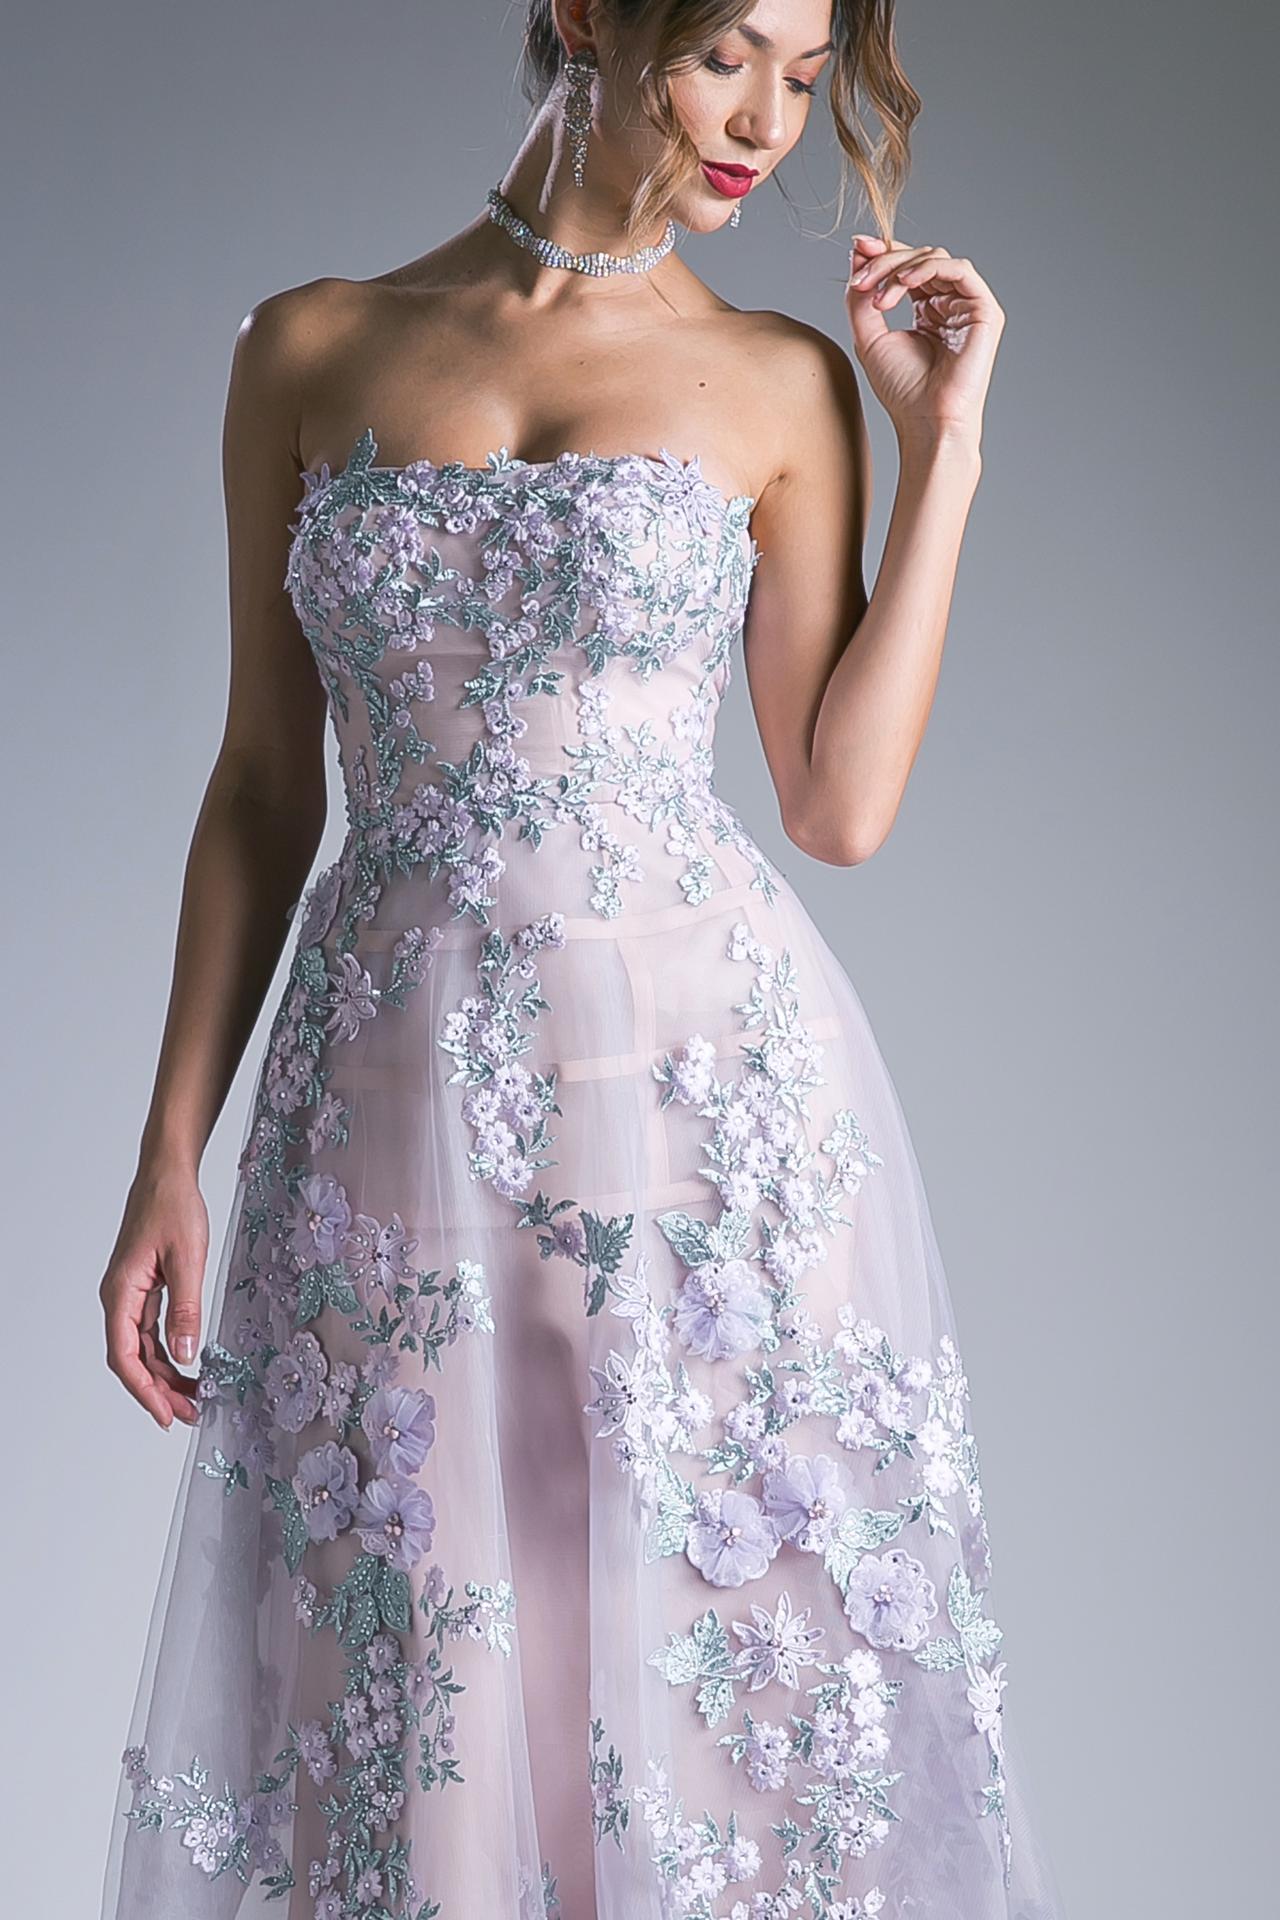 Nové spoločenské šaty :) - Obrázok č. 5